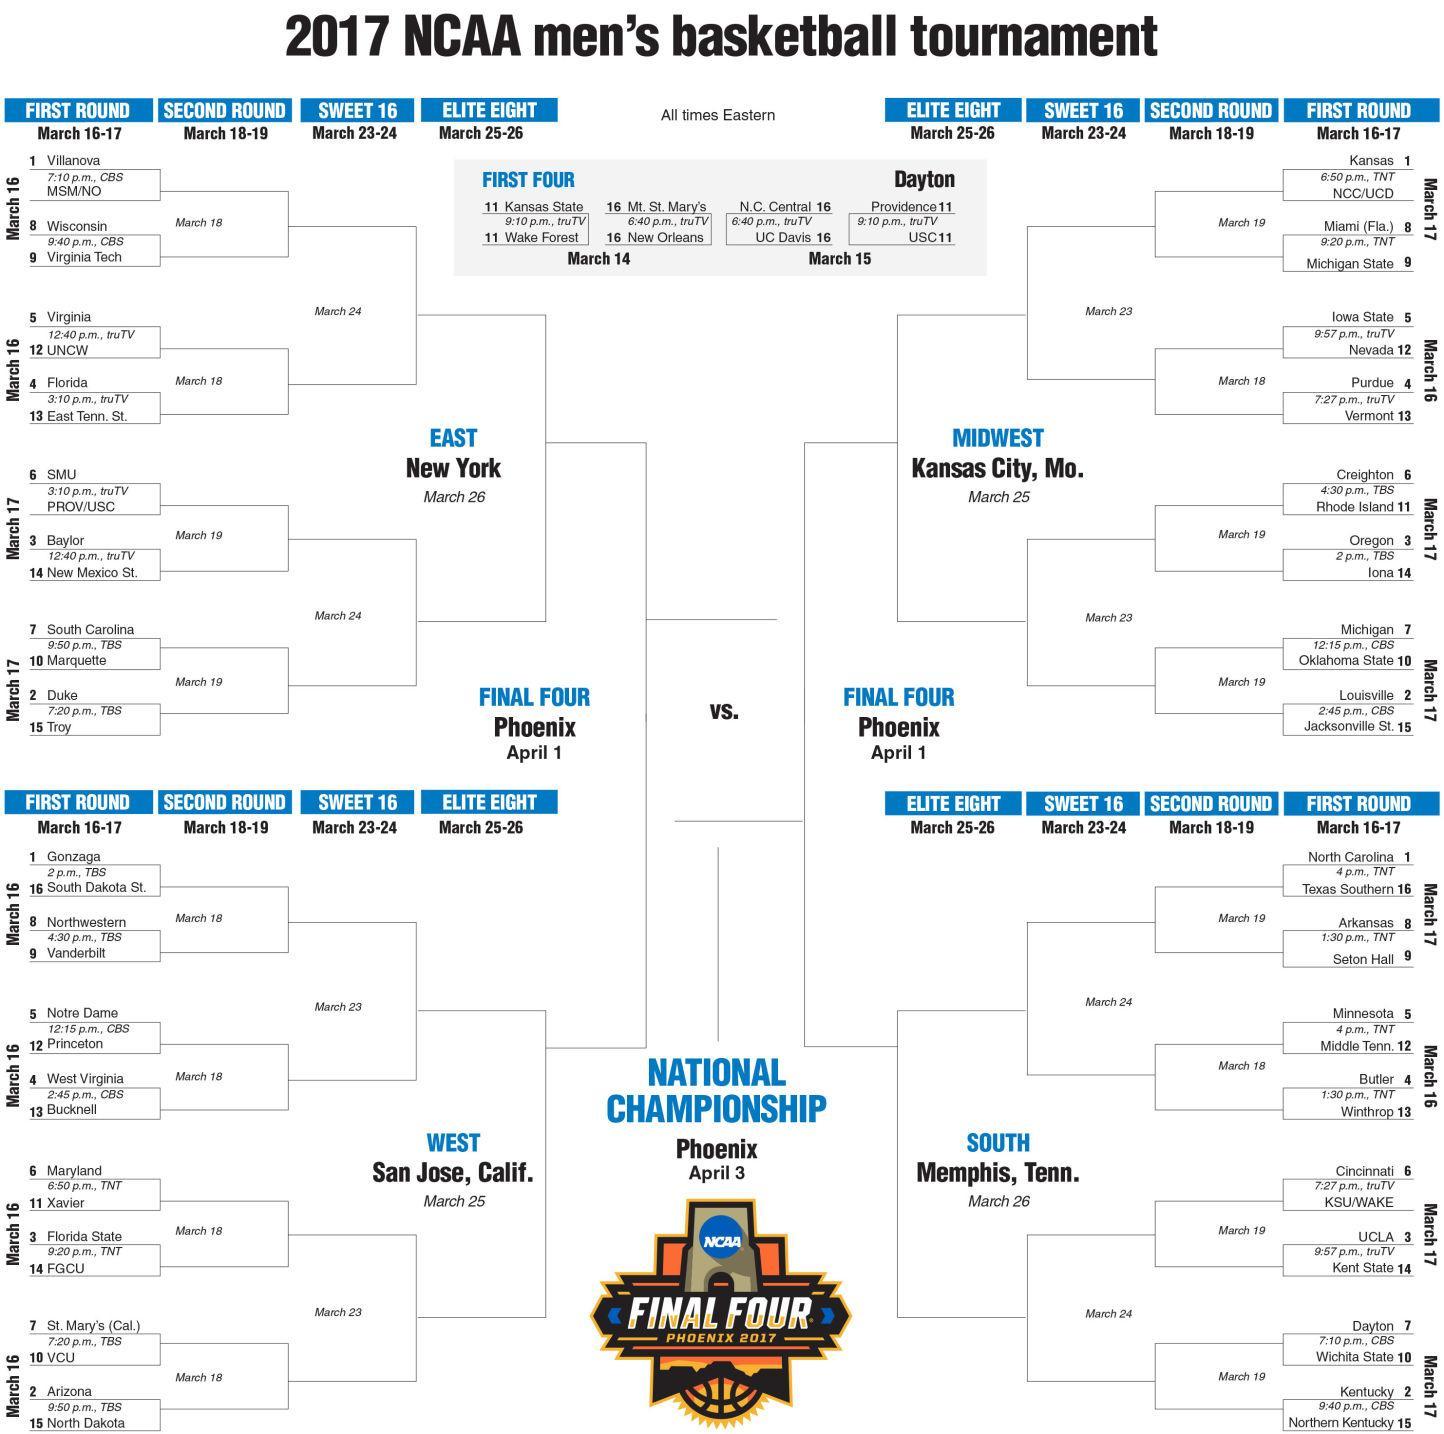 Brackets for the 2017 NCAA men's basketball tournament. TNS 2017